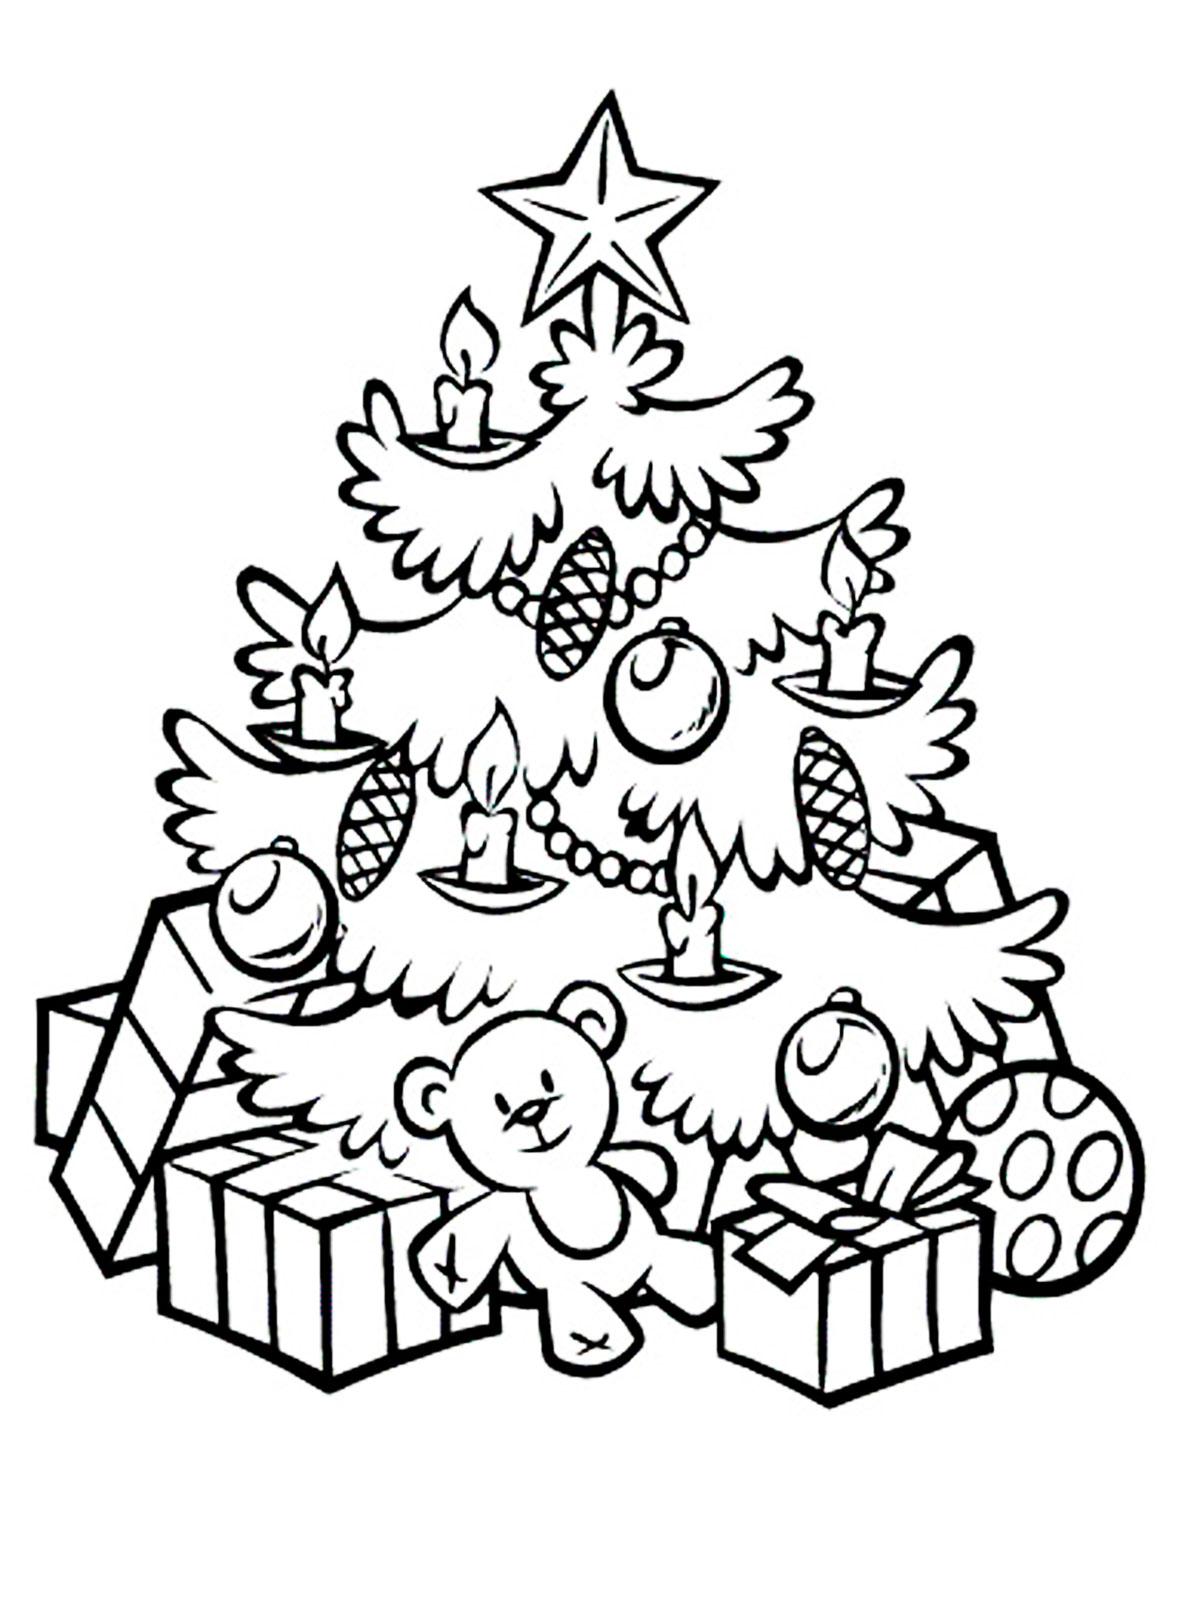 Раскраска елочка на новый год